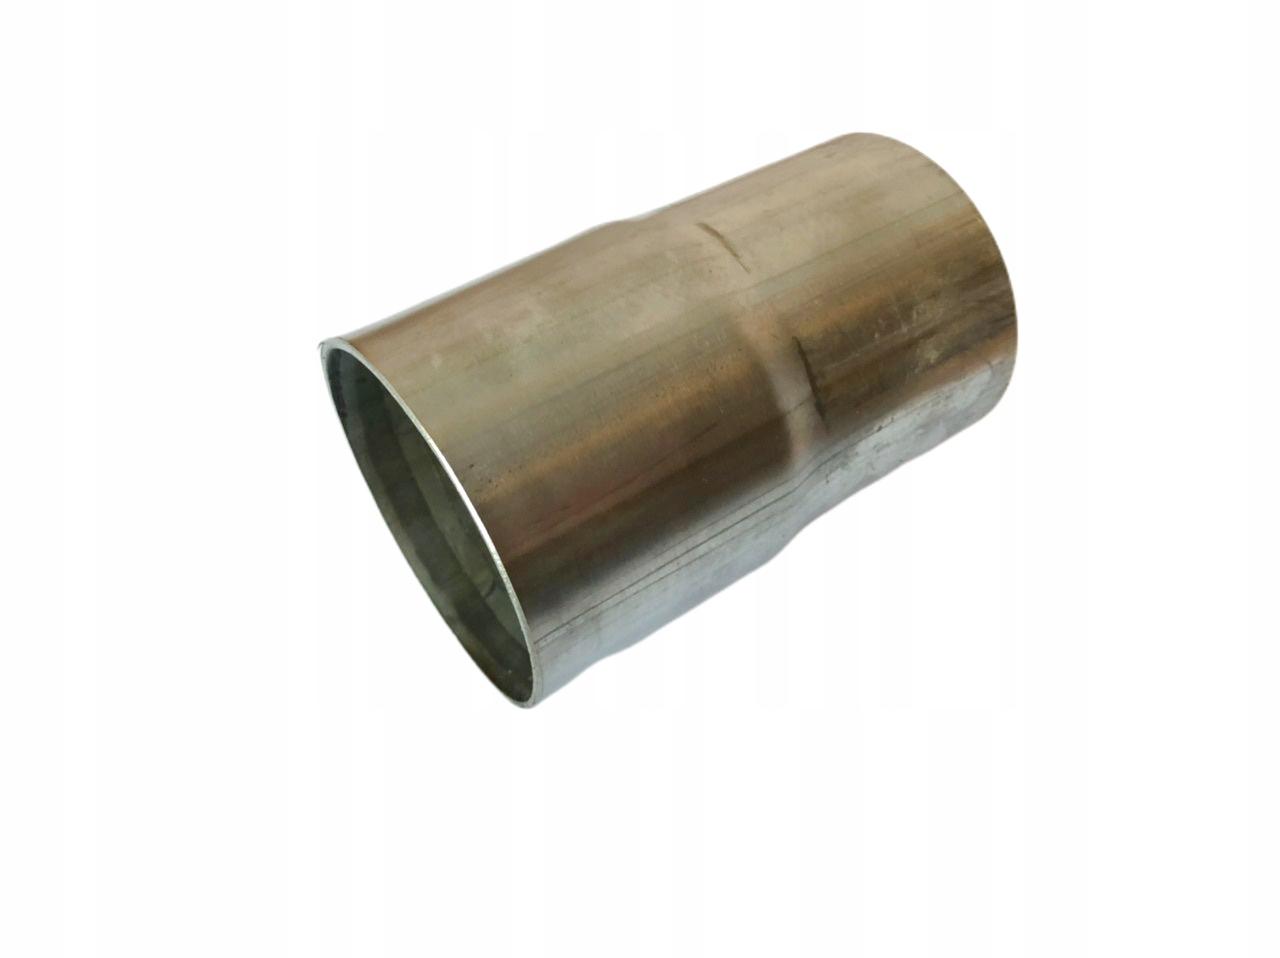 уменьшение заколка roztłoczenie сталь 576063